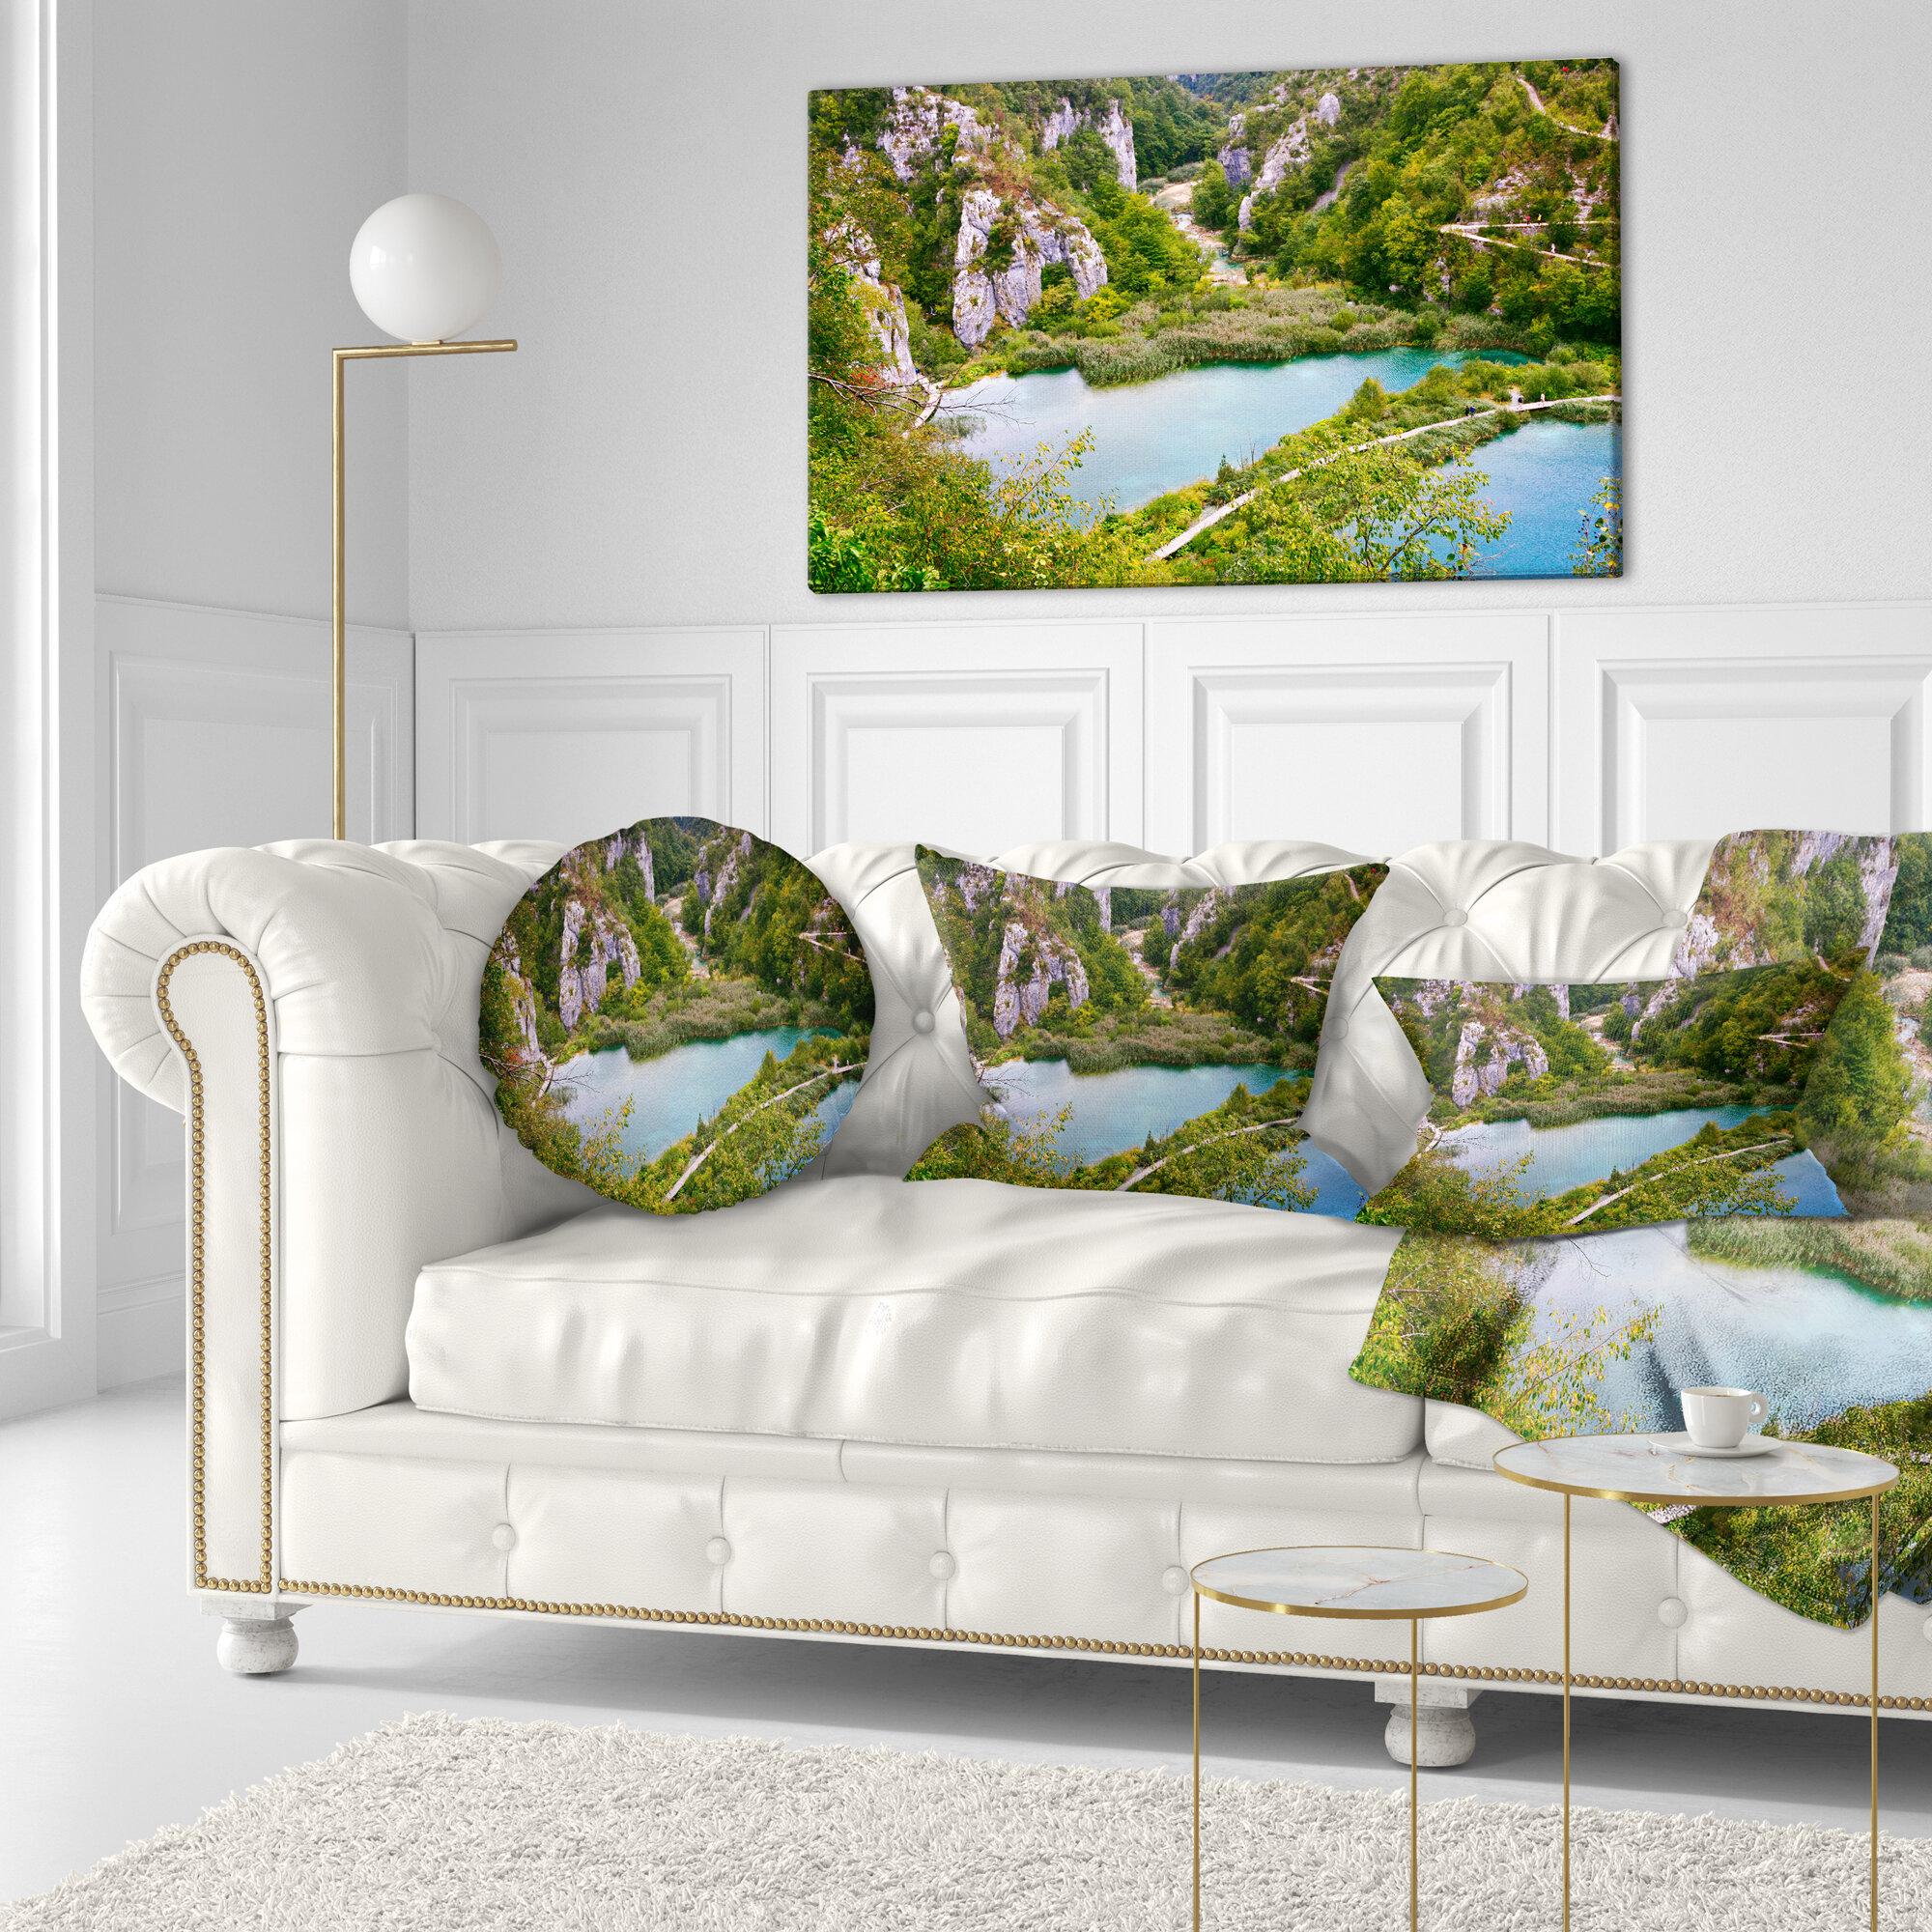 East Urban Home Landscape Photo Plitvice Lakes Long View Lumbar Pillow Wayfair